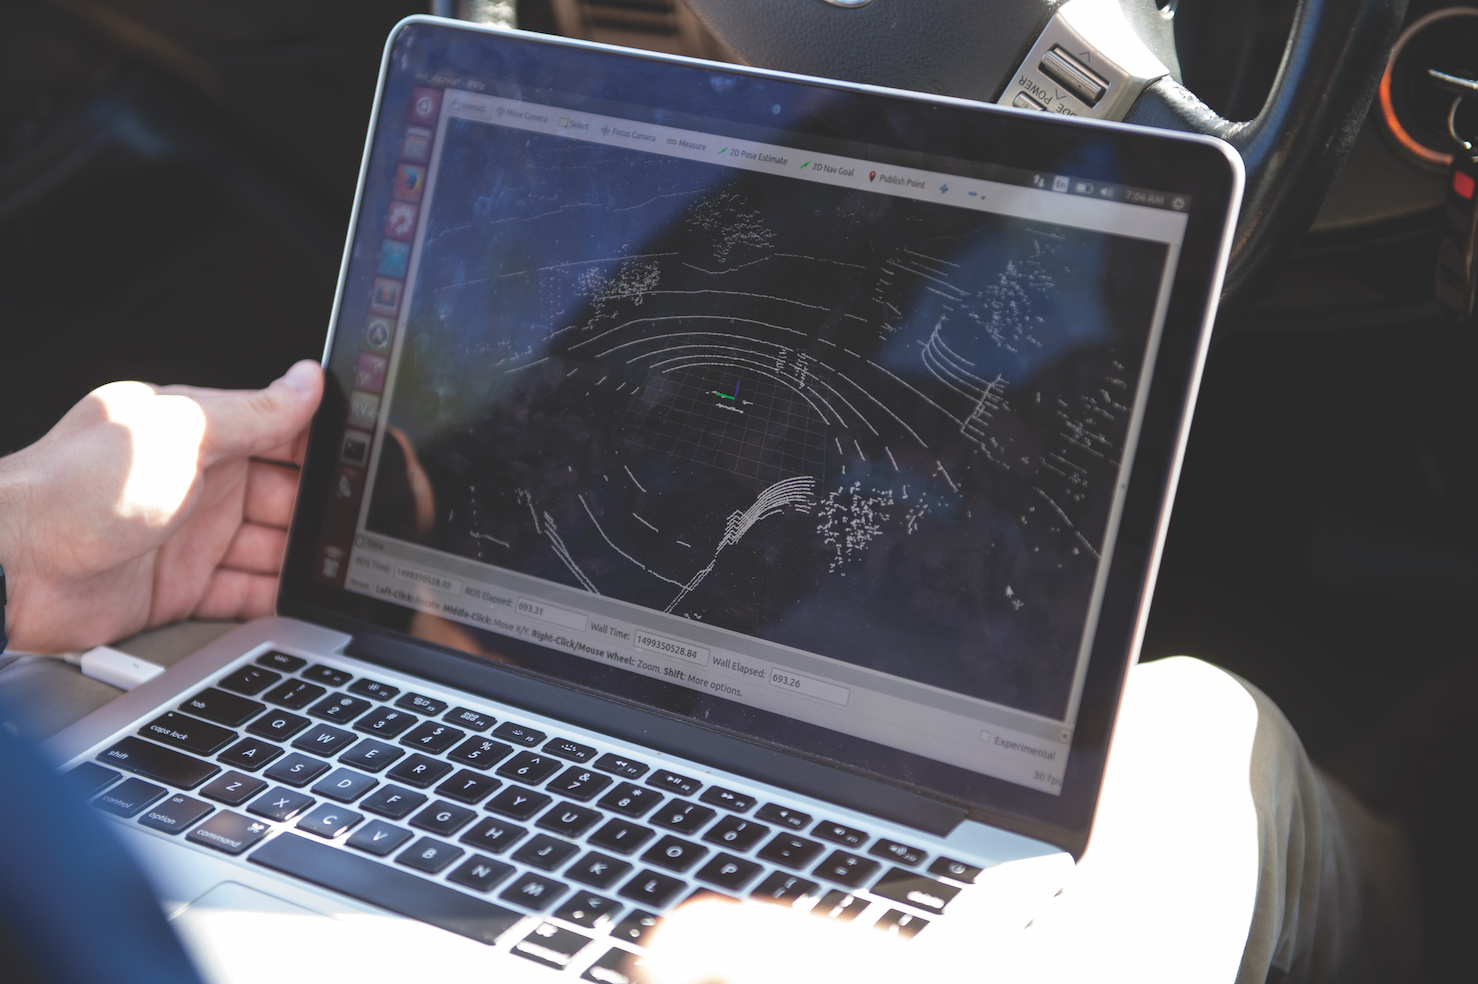 An Auburn University students monitors truck platooning testing on a laptop computer.